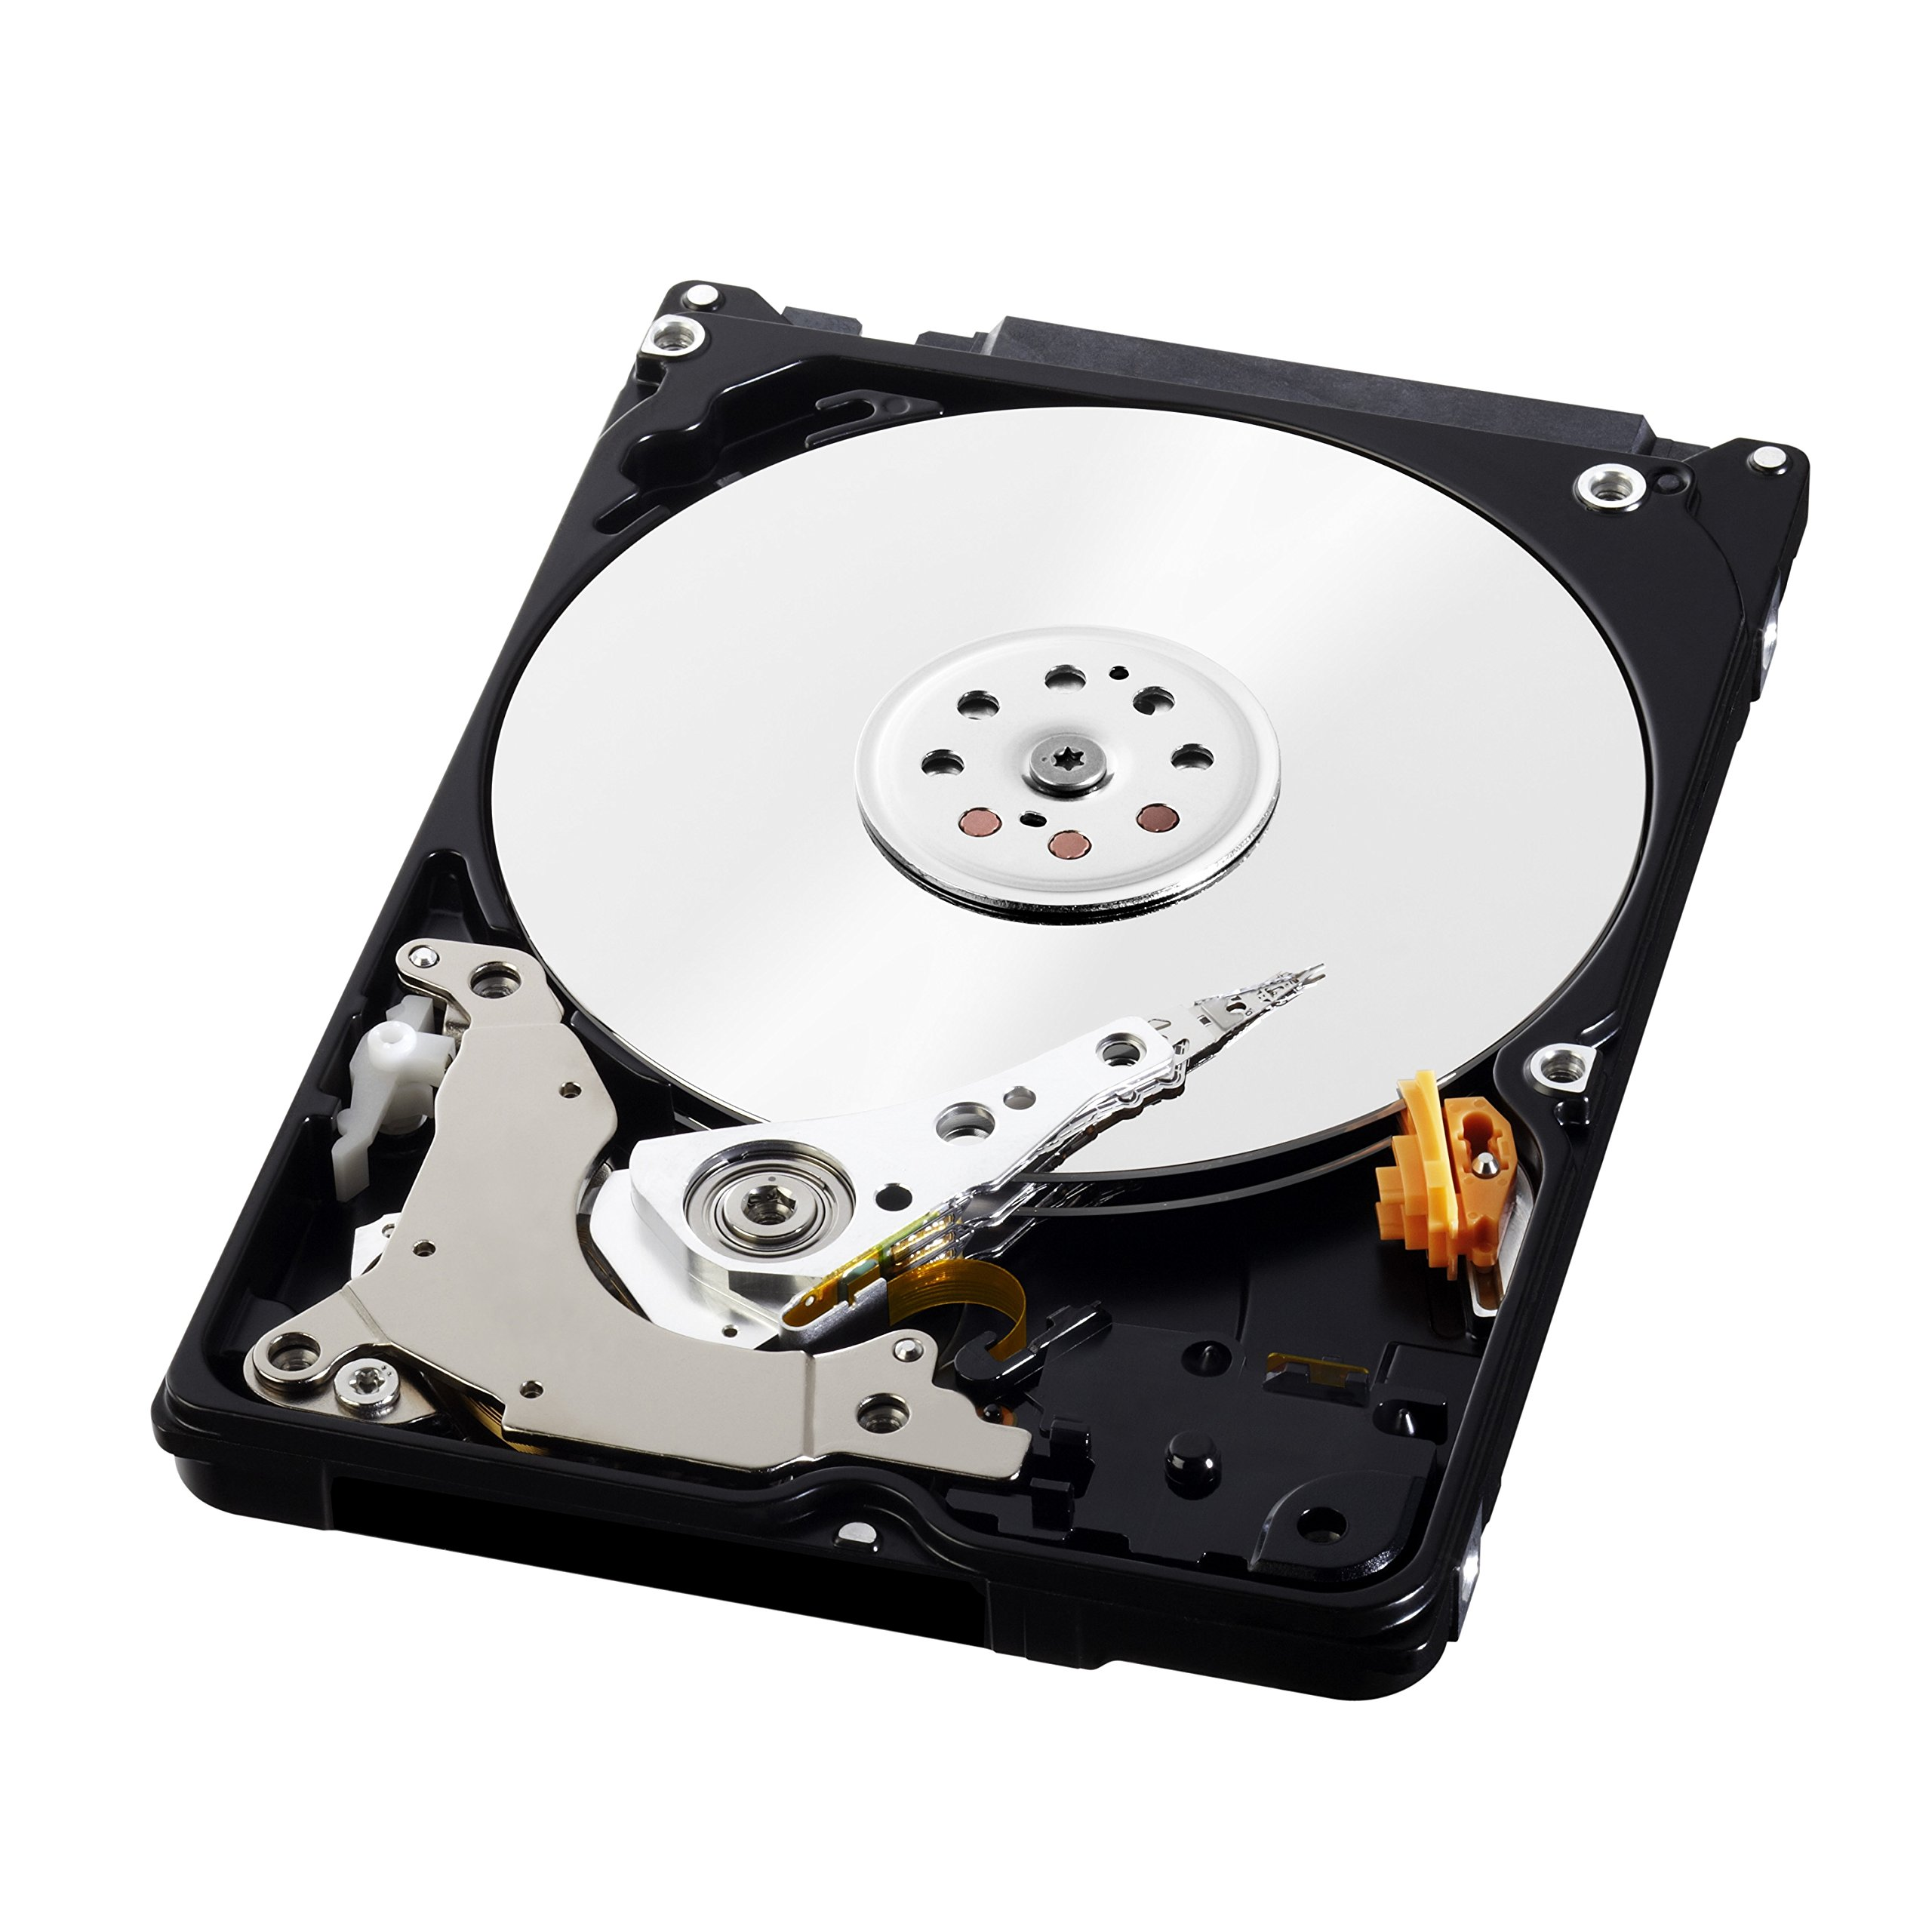 WD Blue 1TB  Mobile Hard Disk Drive - 5400 RPM SATA 6 Gb/s  9.5 MM 2.5 Inch  - WD10JPVX